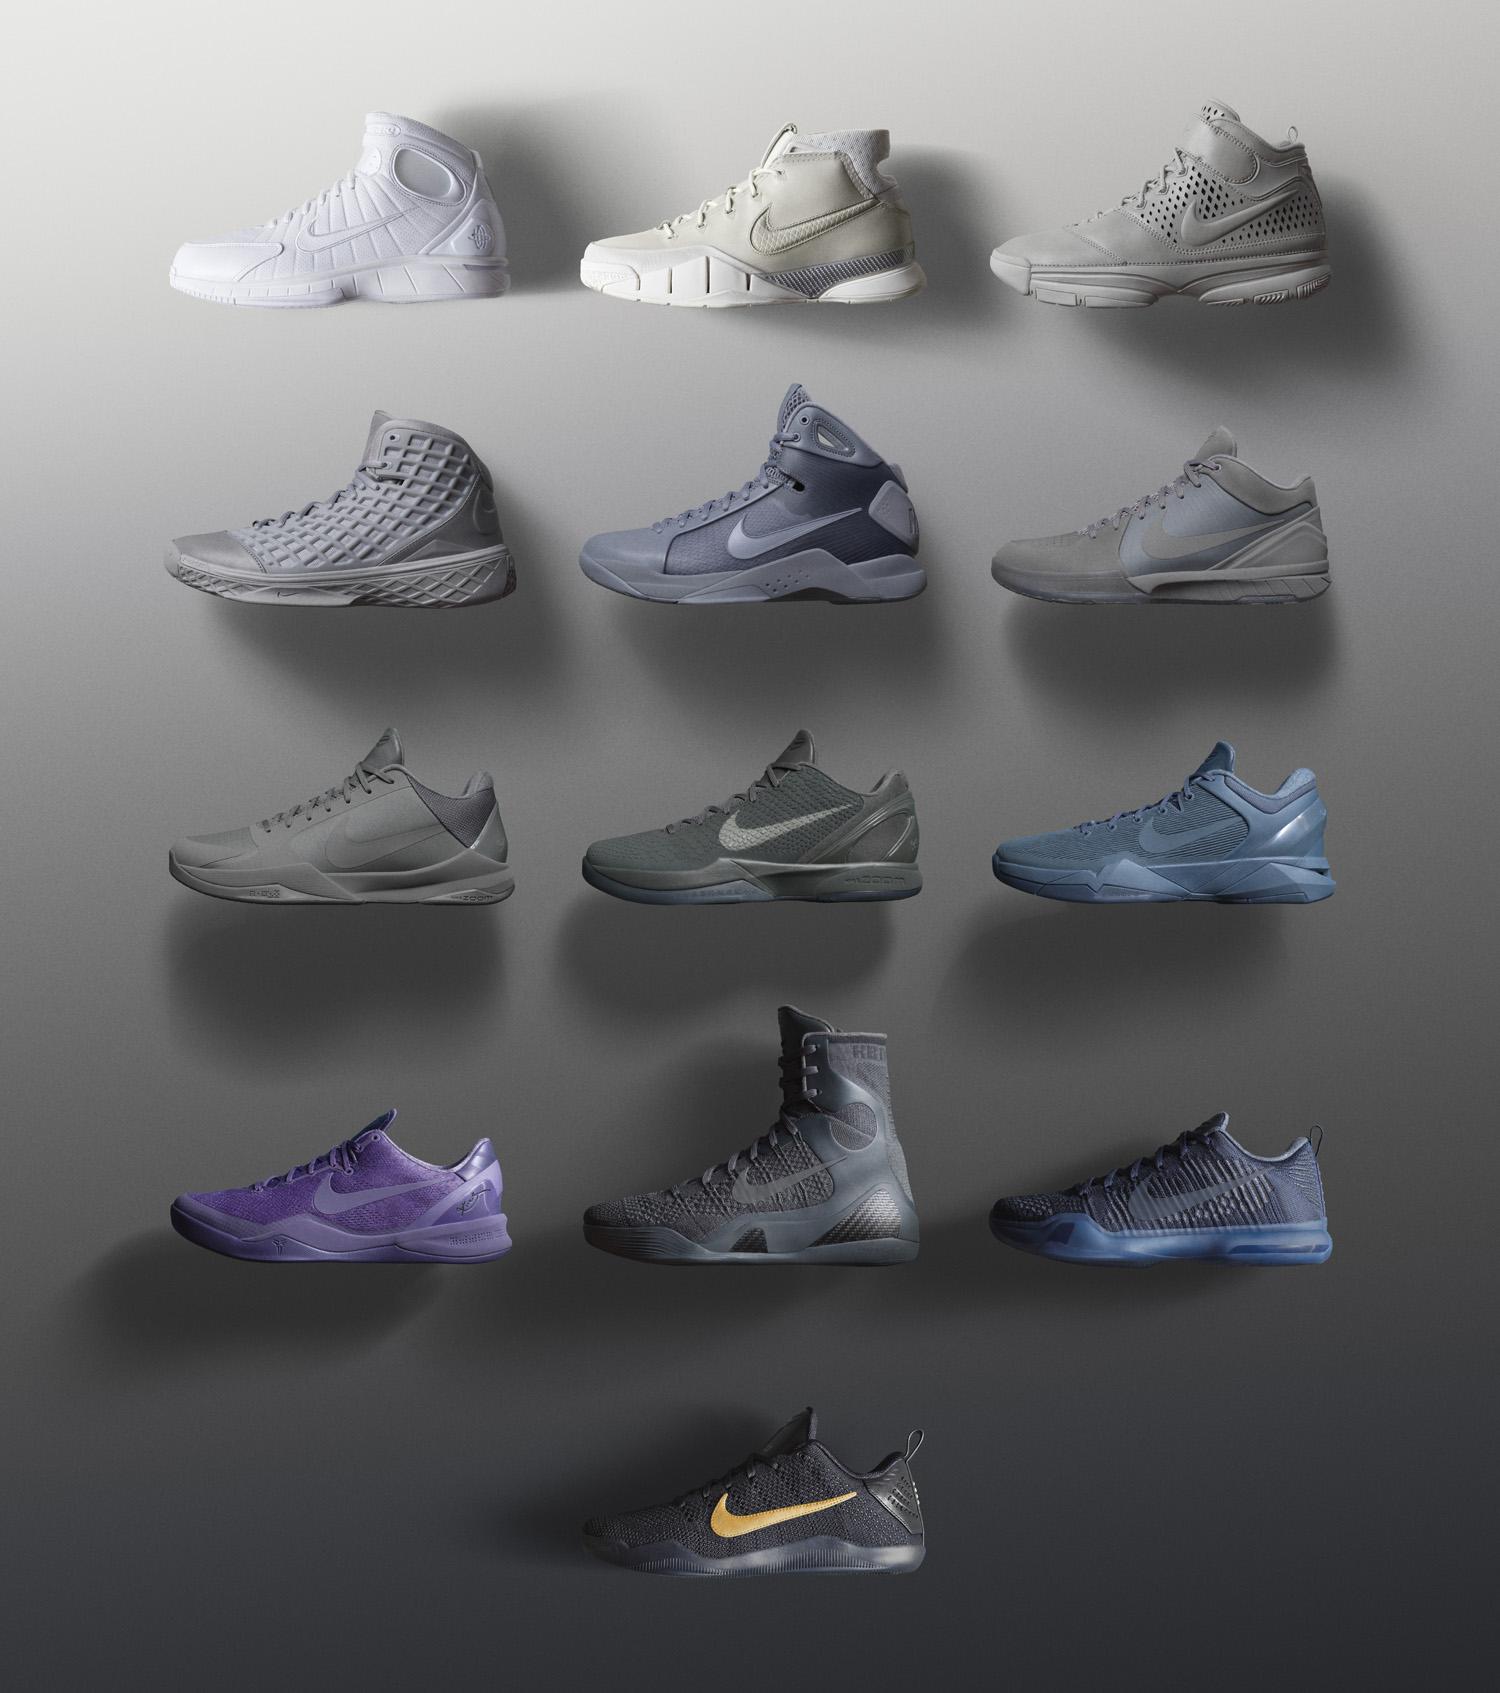 4f763b86ec2e3 Nike Kobe Fade to Black FTB Collection